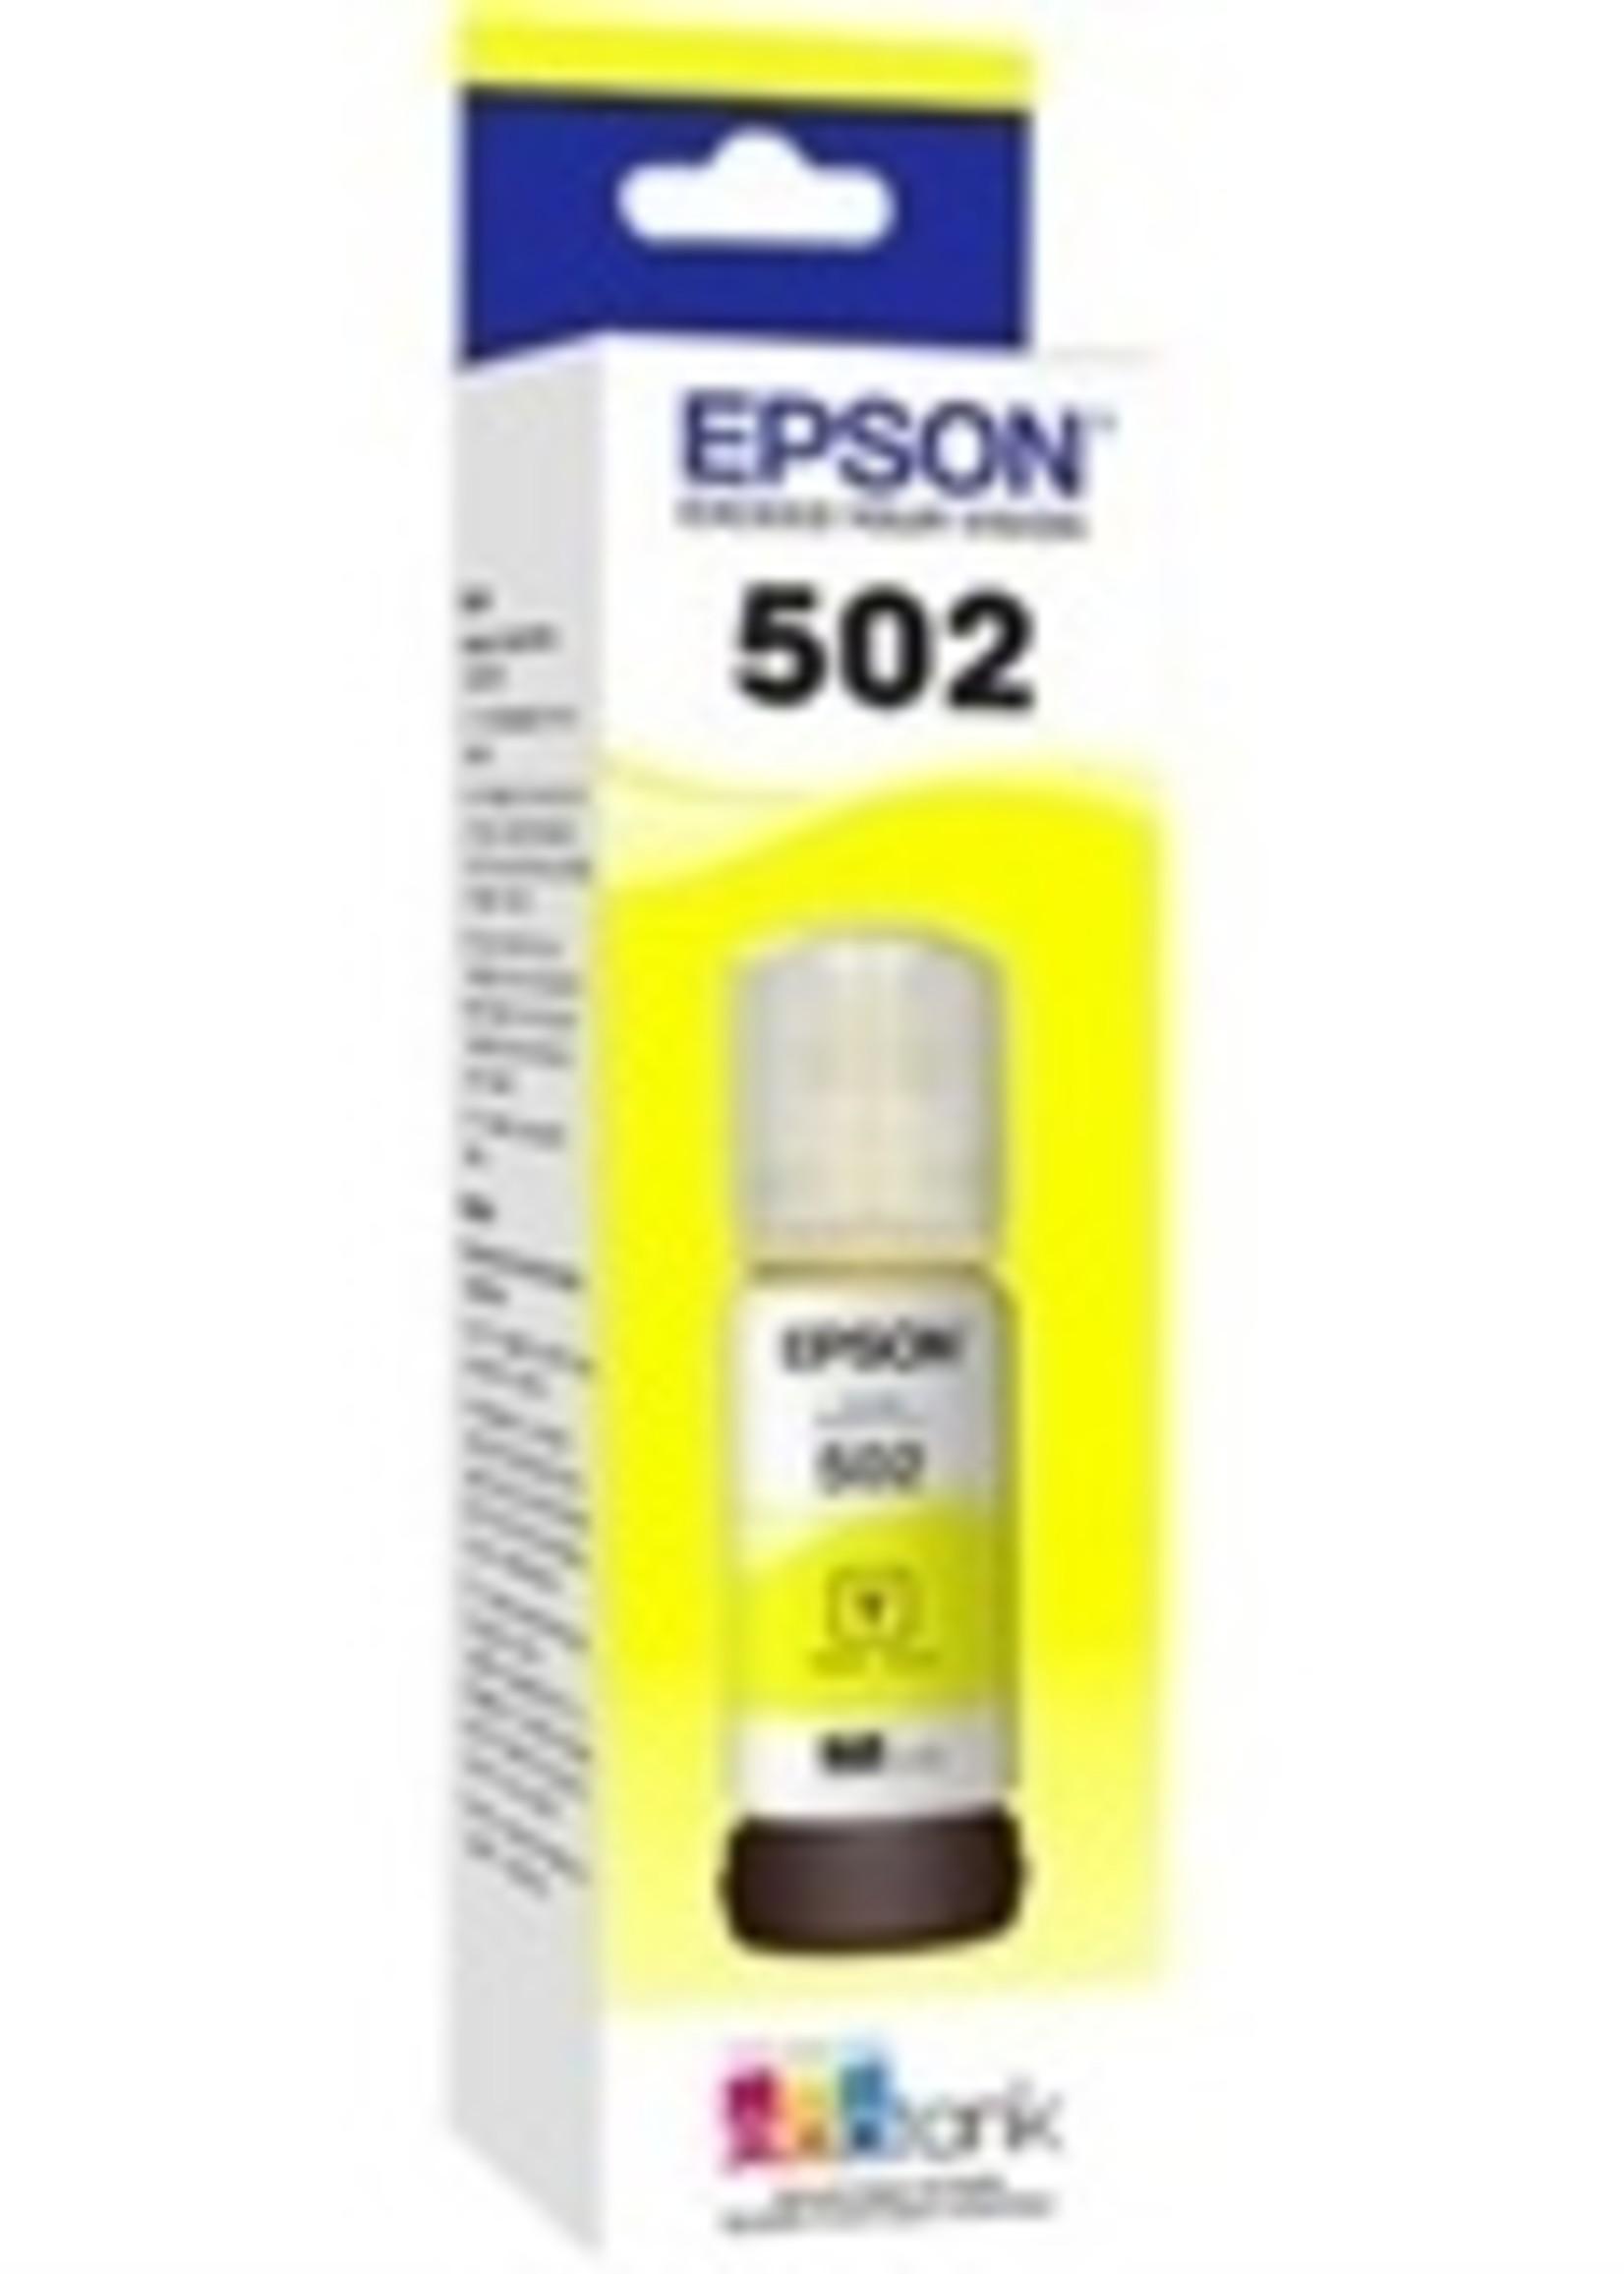 Epson Epson T502, Yellow Ink Bottle